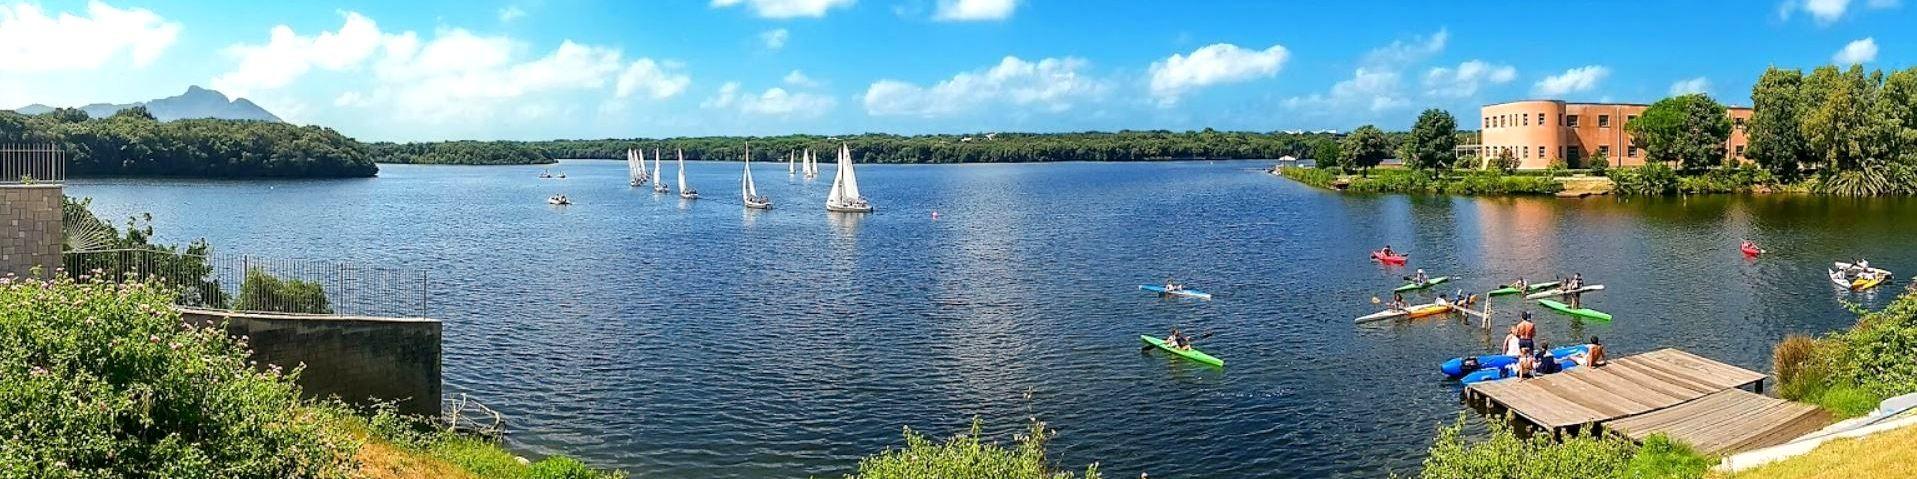 Lago di Sabaudia